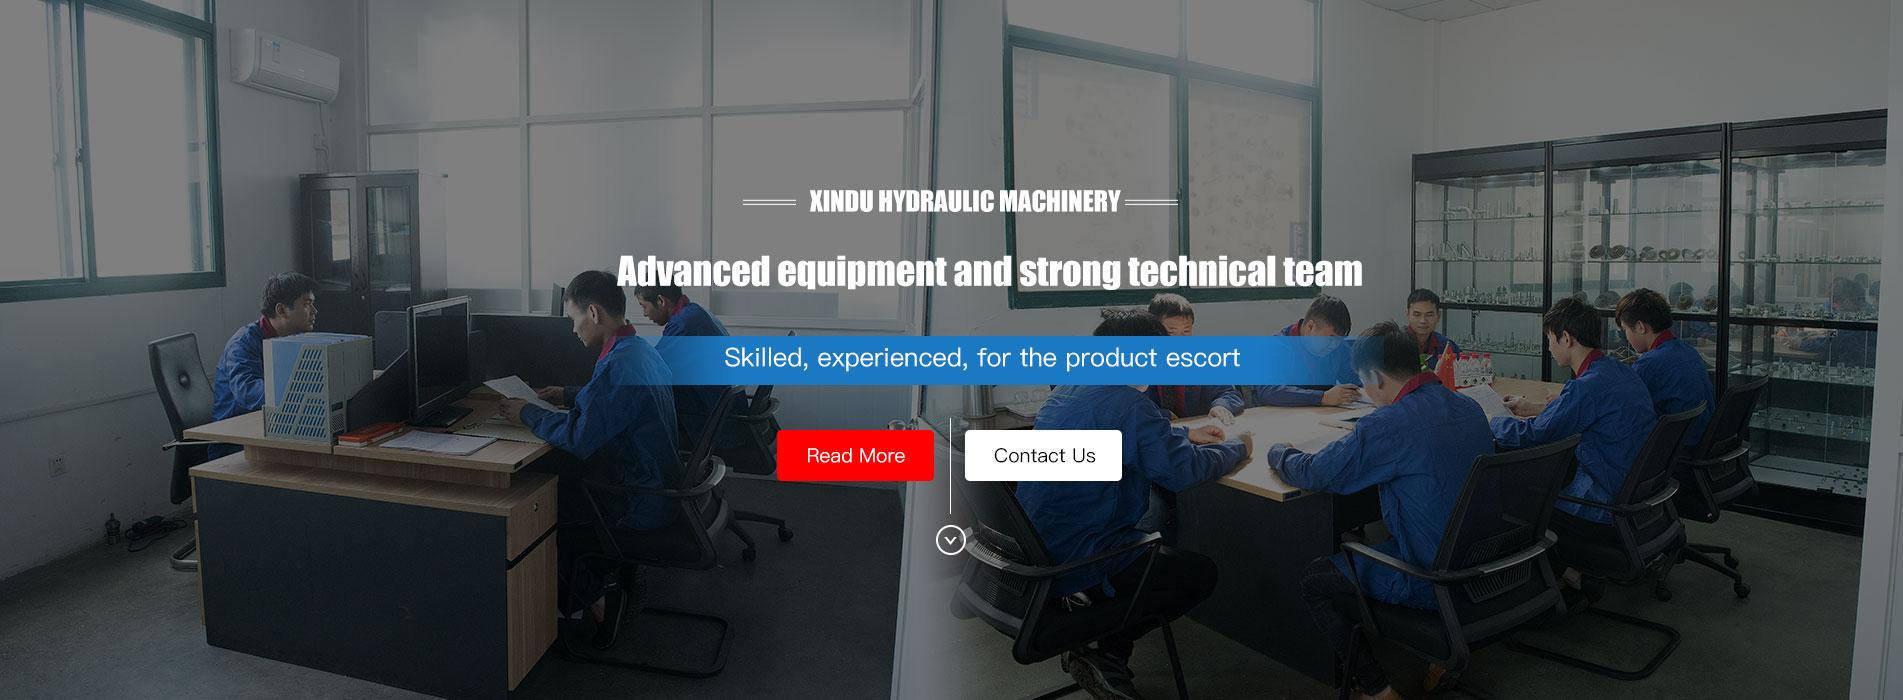 Ningbo Xindu Hydraulic Machinery Co.,Ltd.